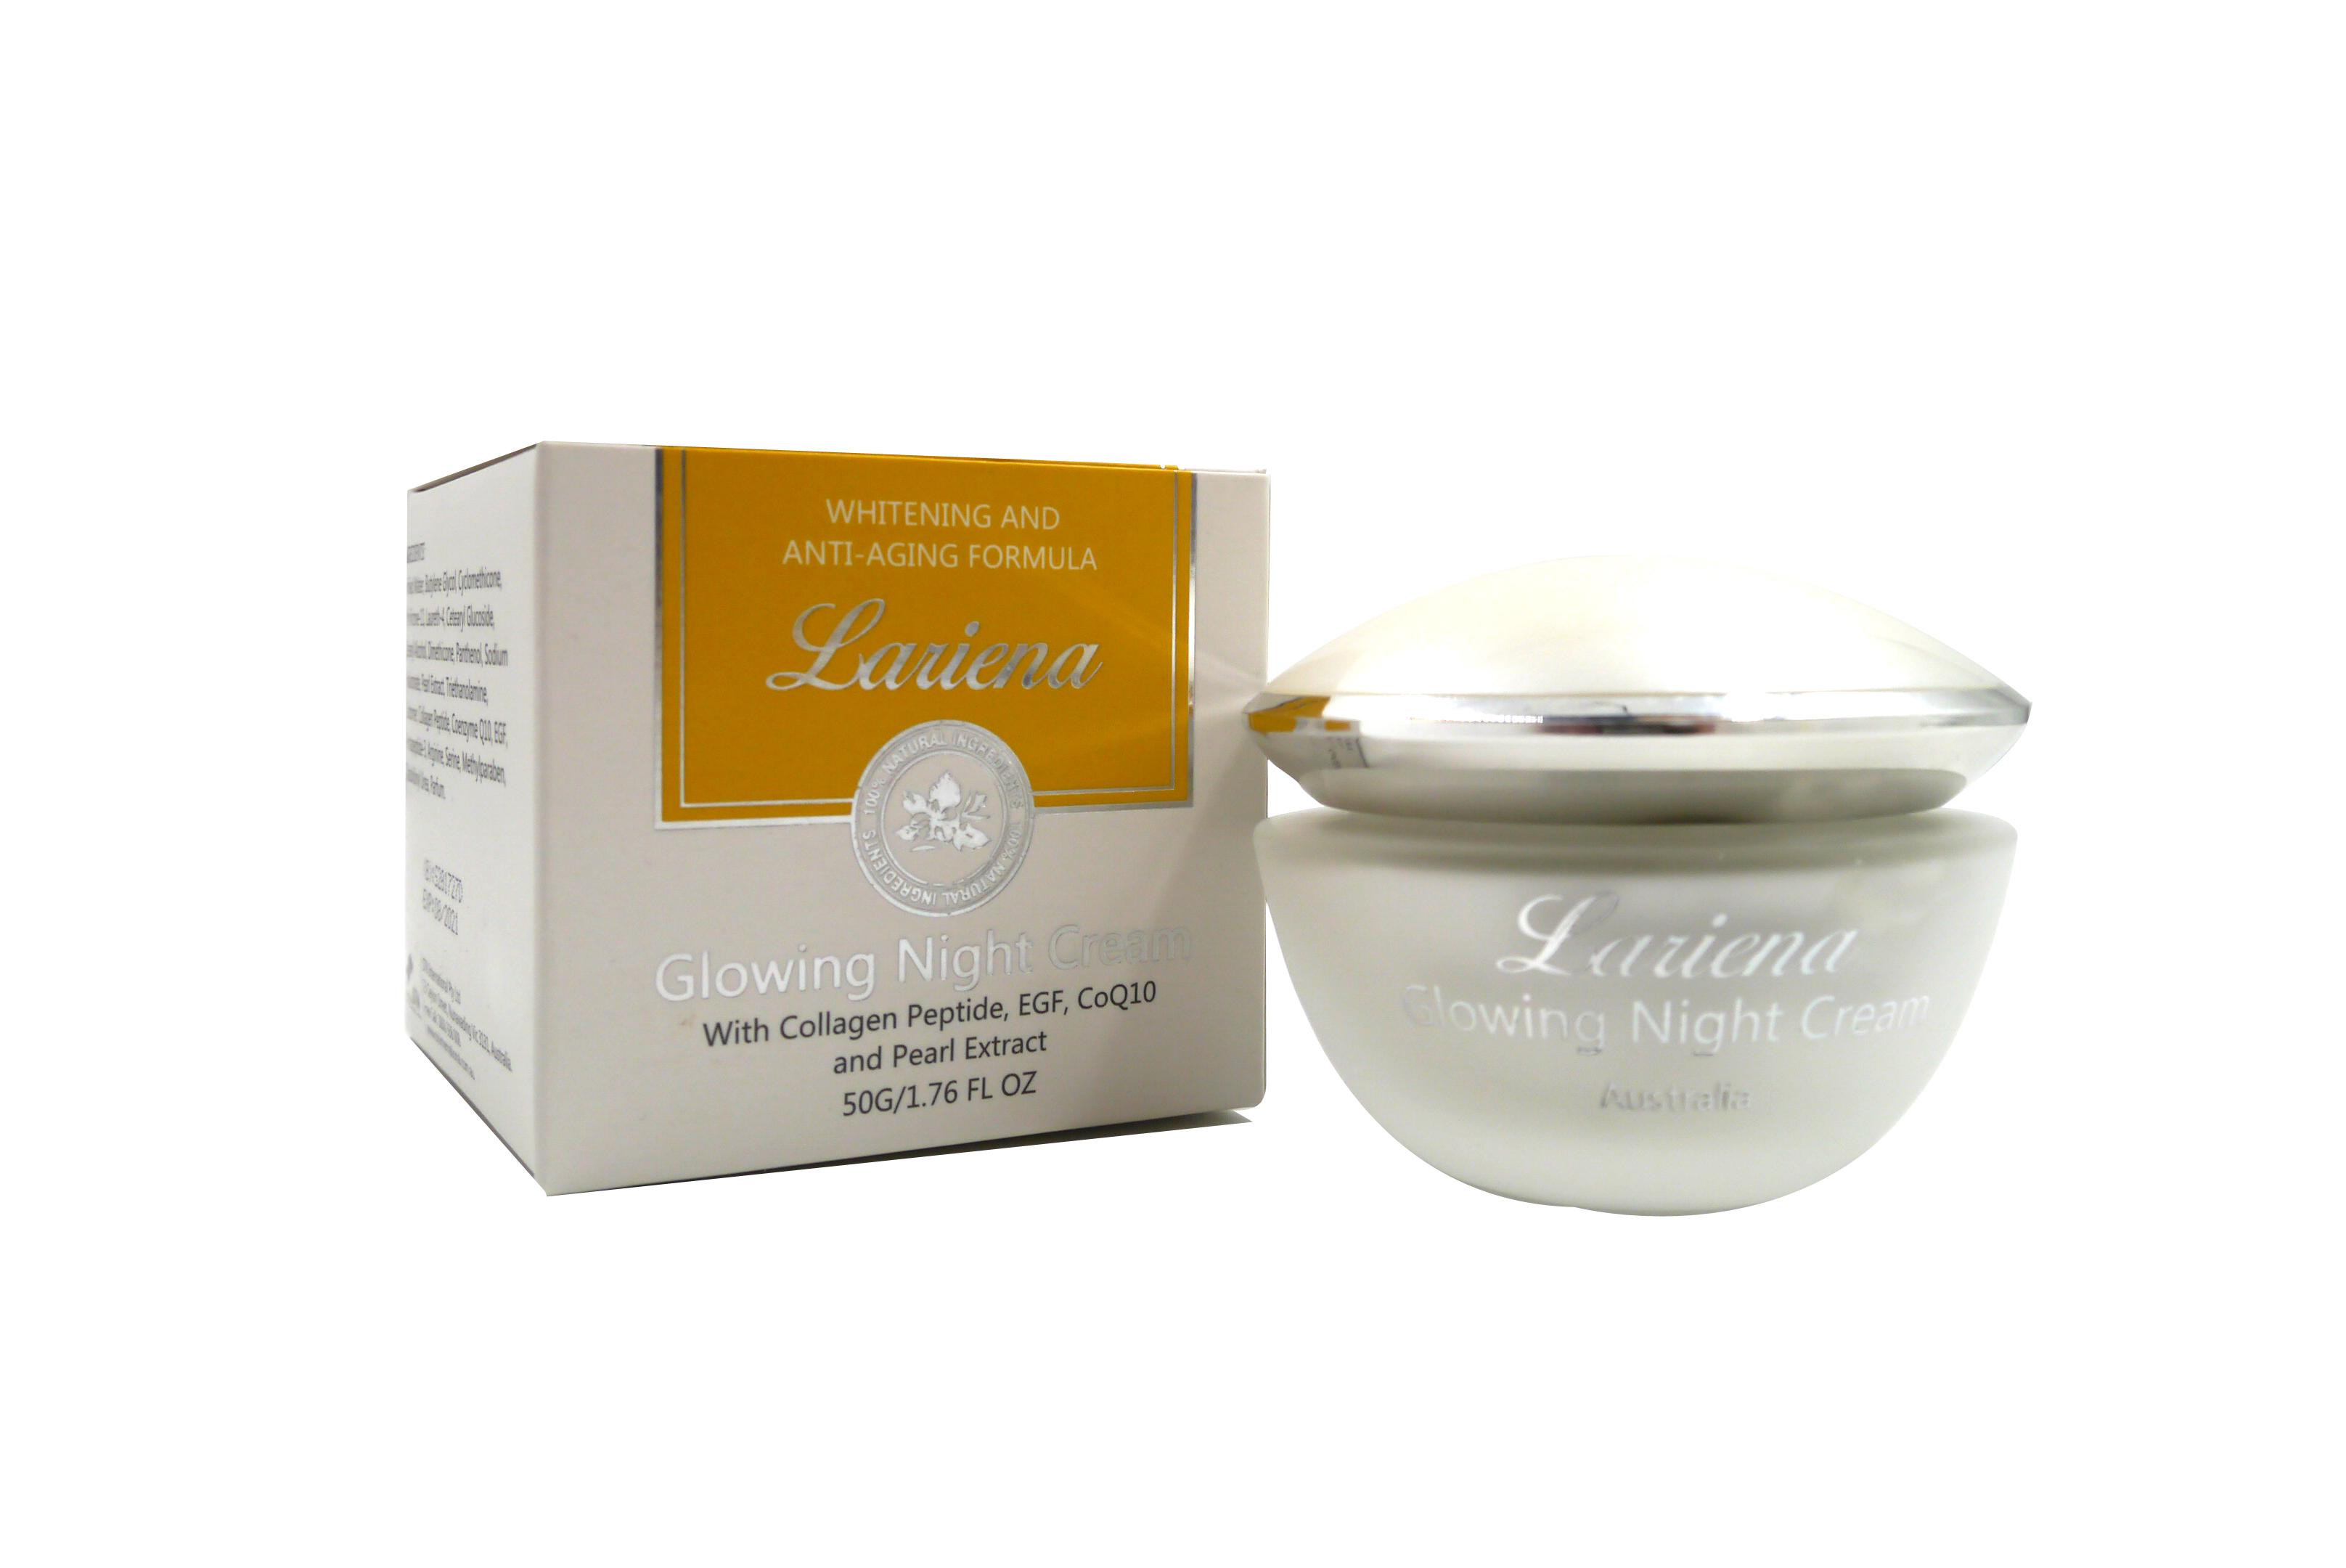 lariena-glowing-night-cream